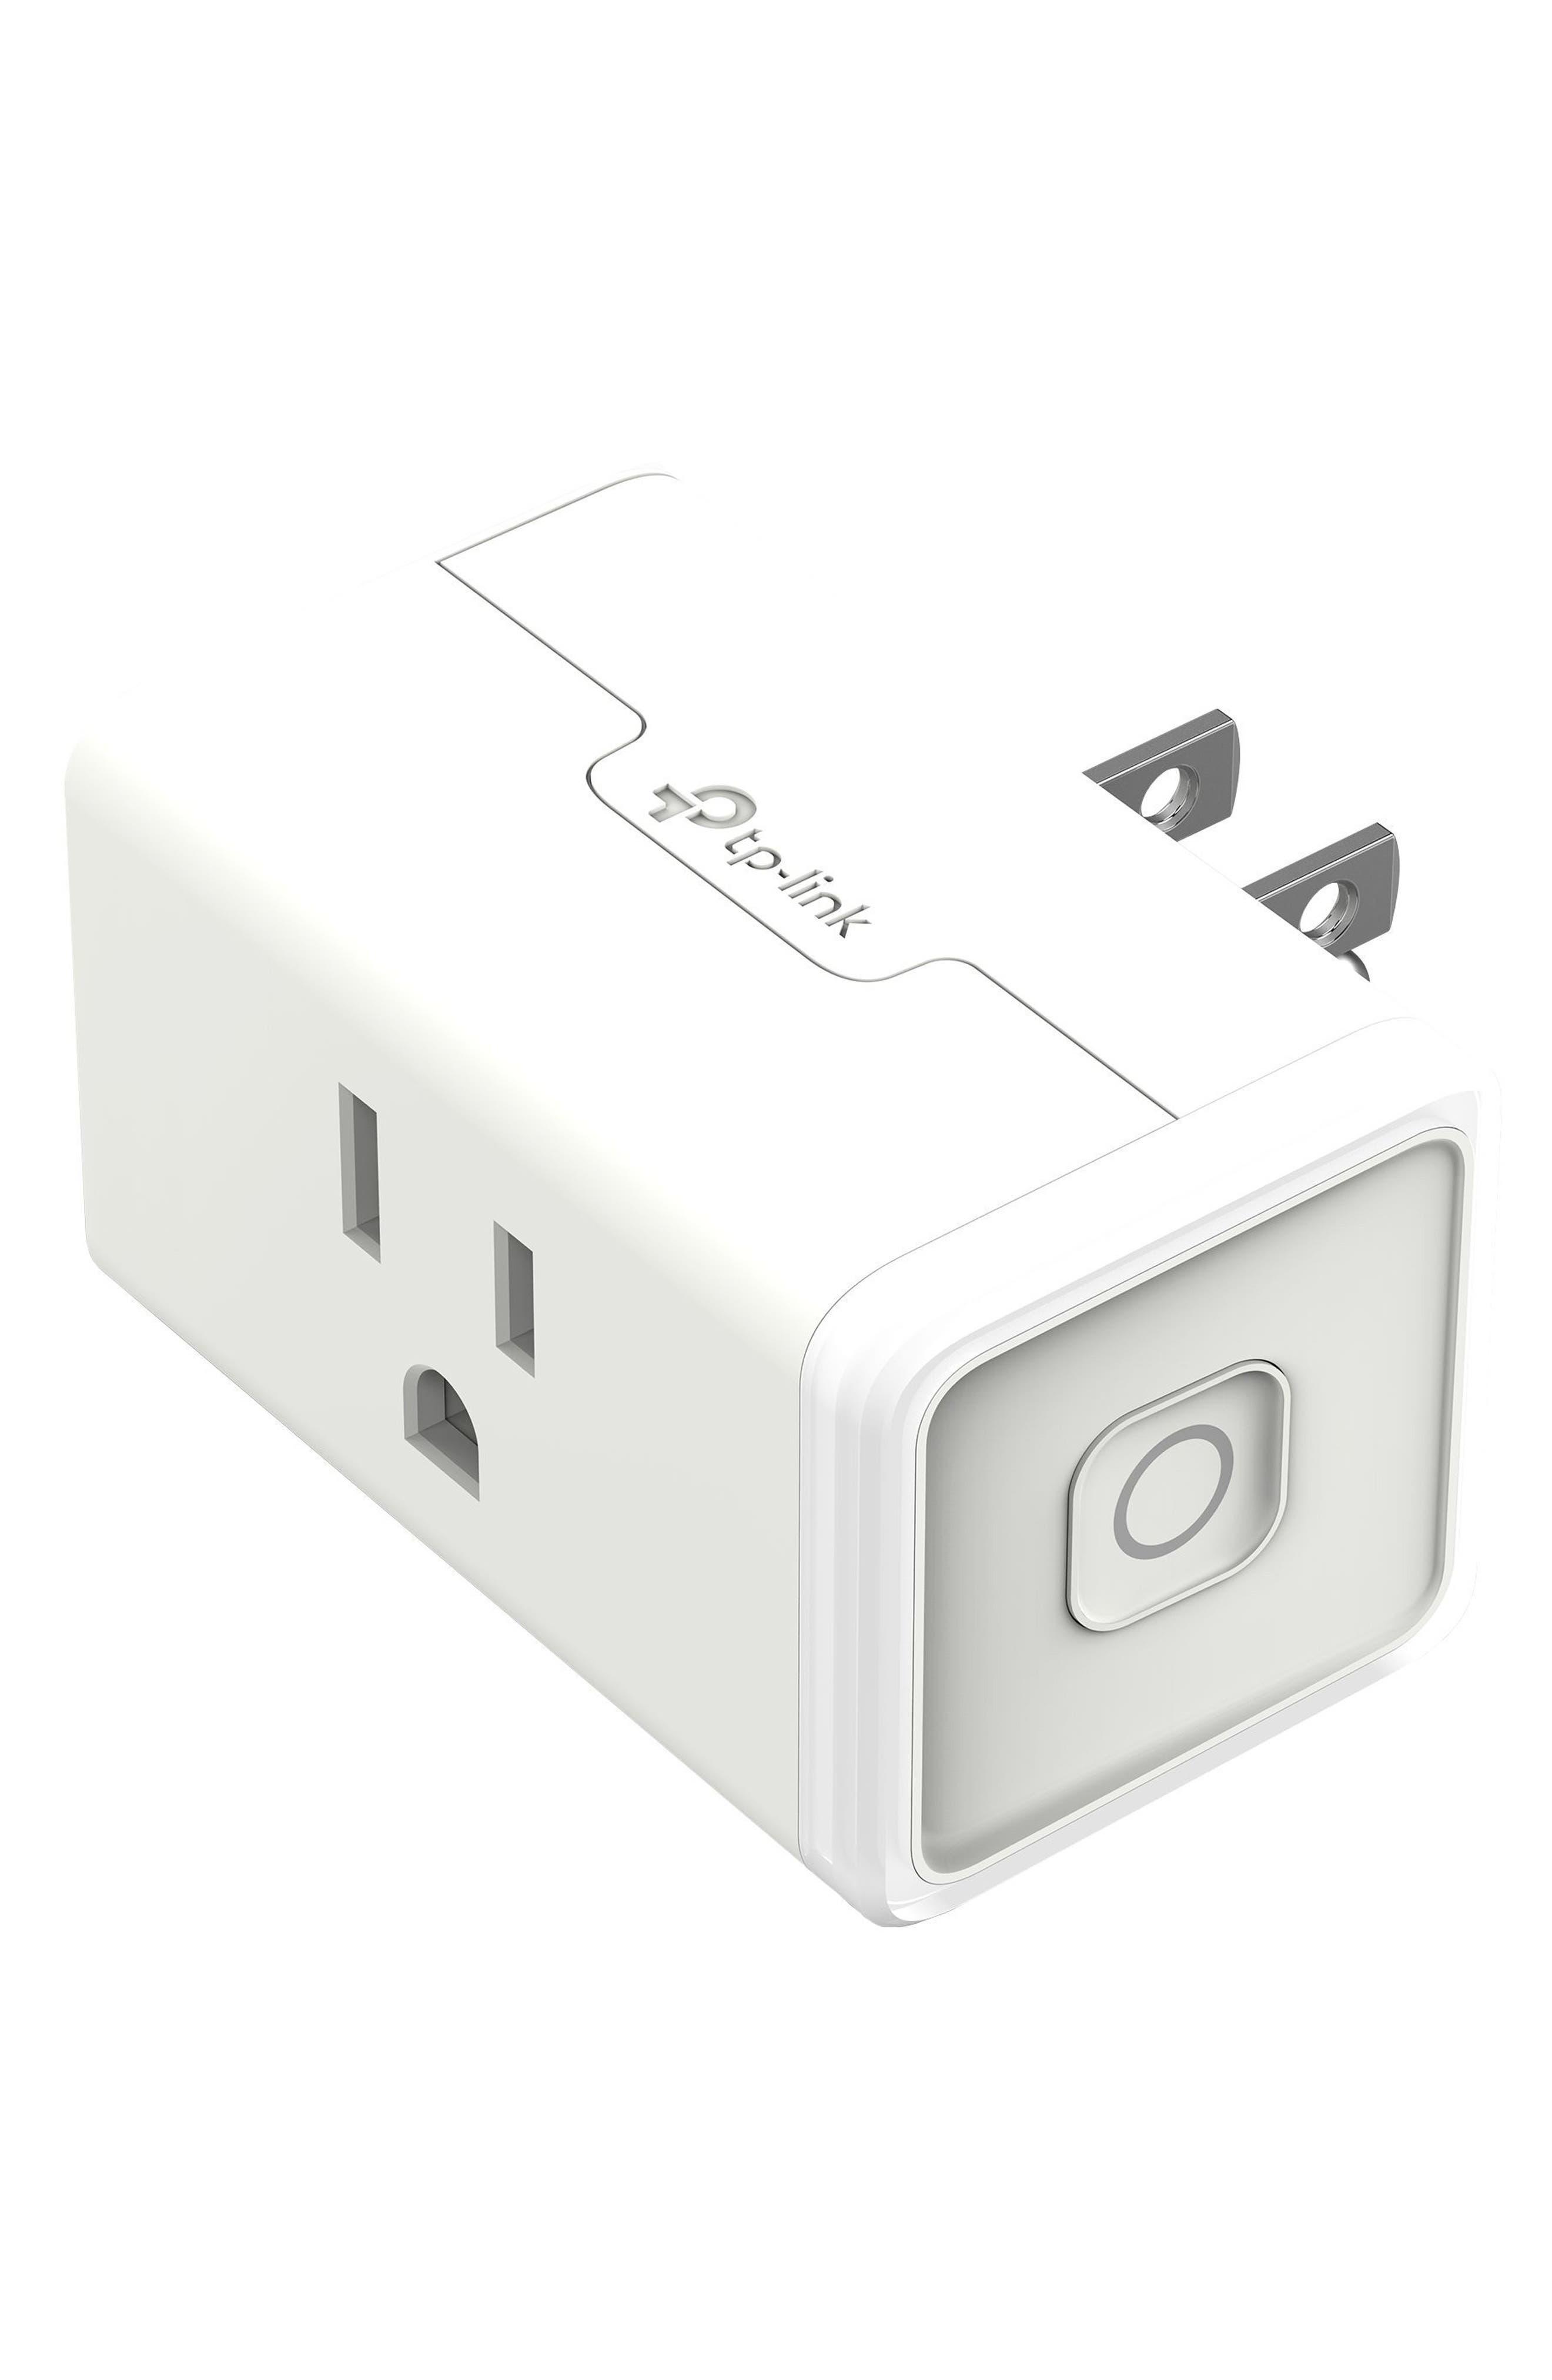 Main Image - TP-Link Smart Wi-Fi Mini Plug